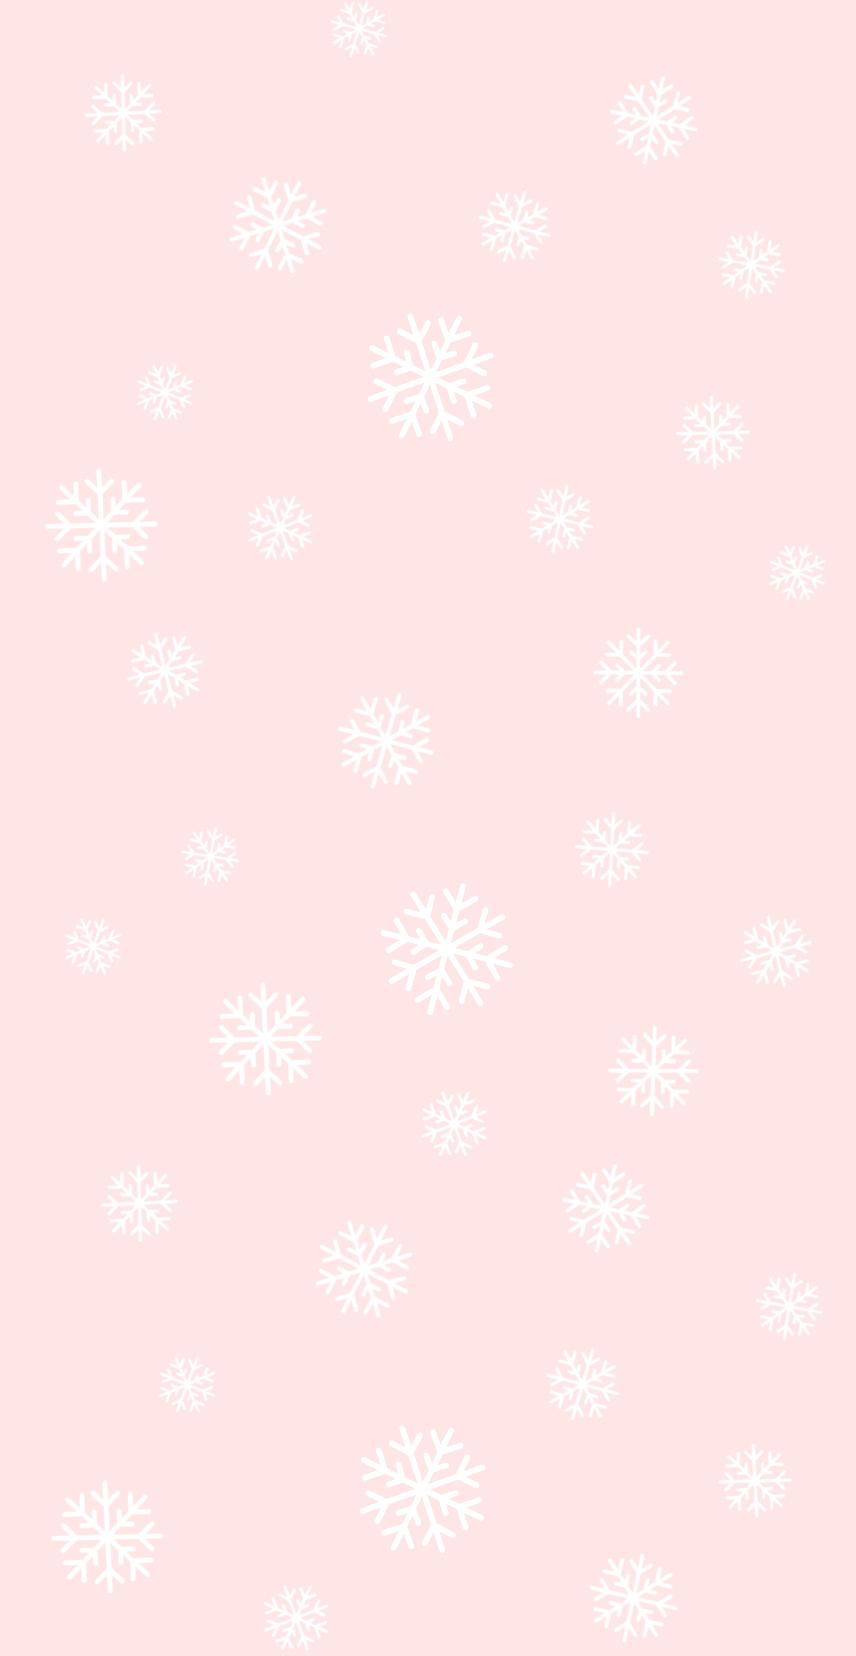 Welcome To Vlogmas 2018 Kristen Shane Phone Wallpaper Pink Christmas Phone Wallpaper Wallpaper Iphone Christmas